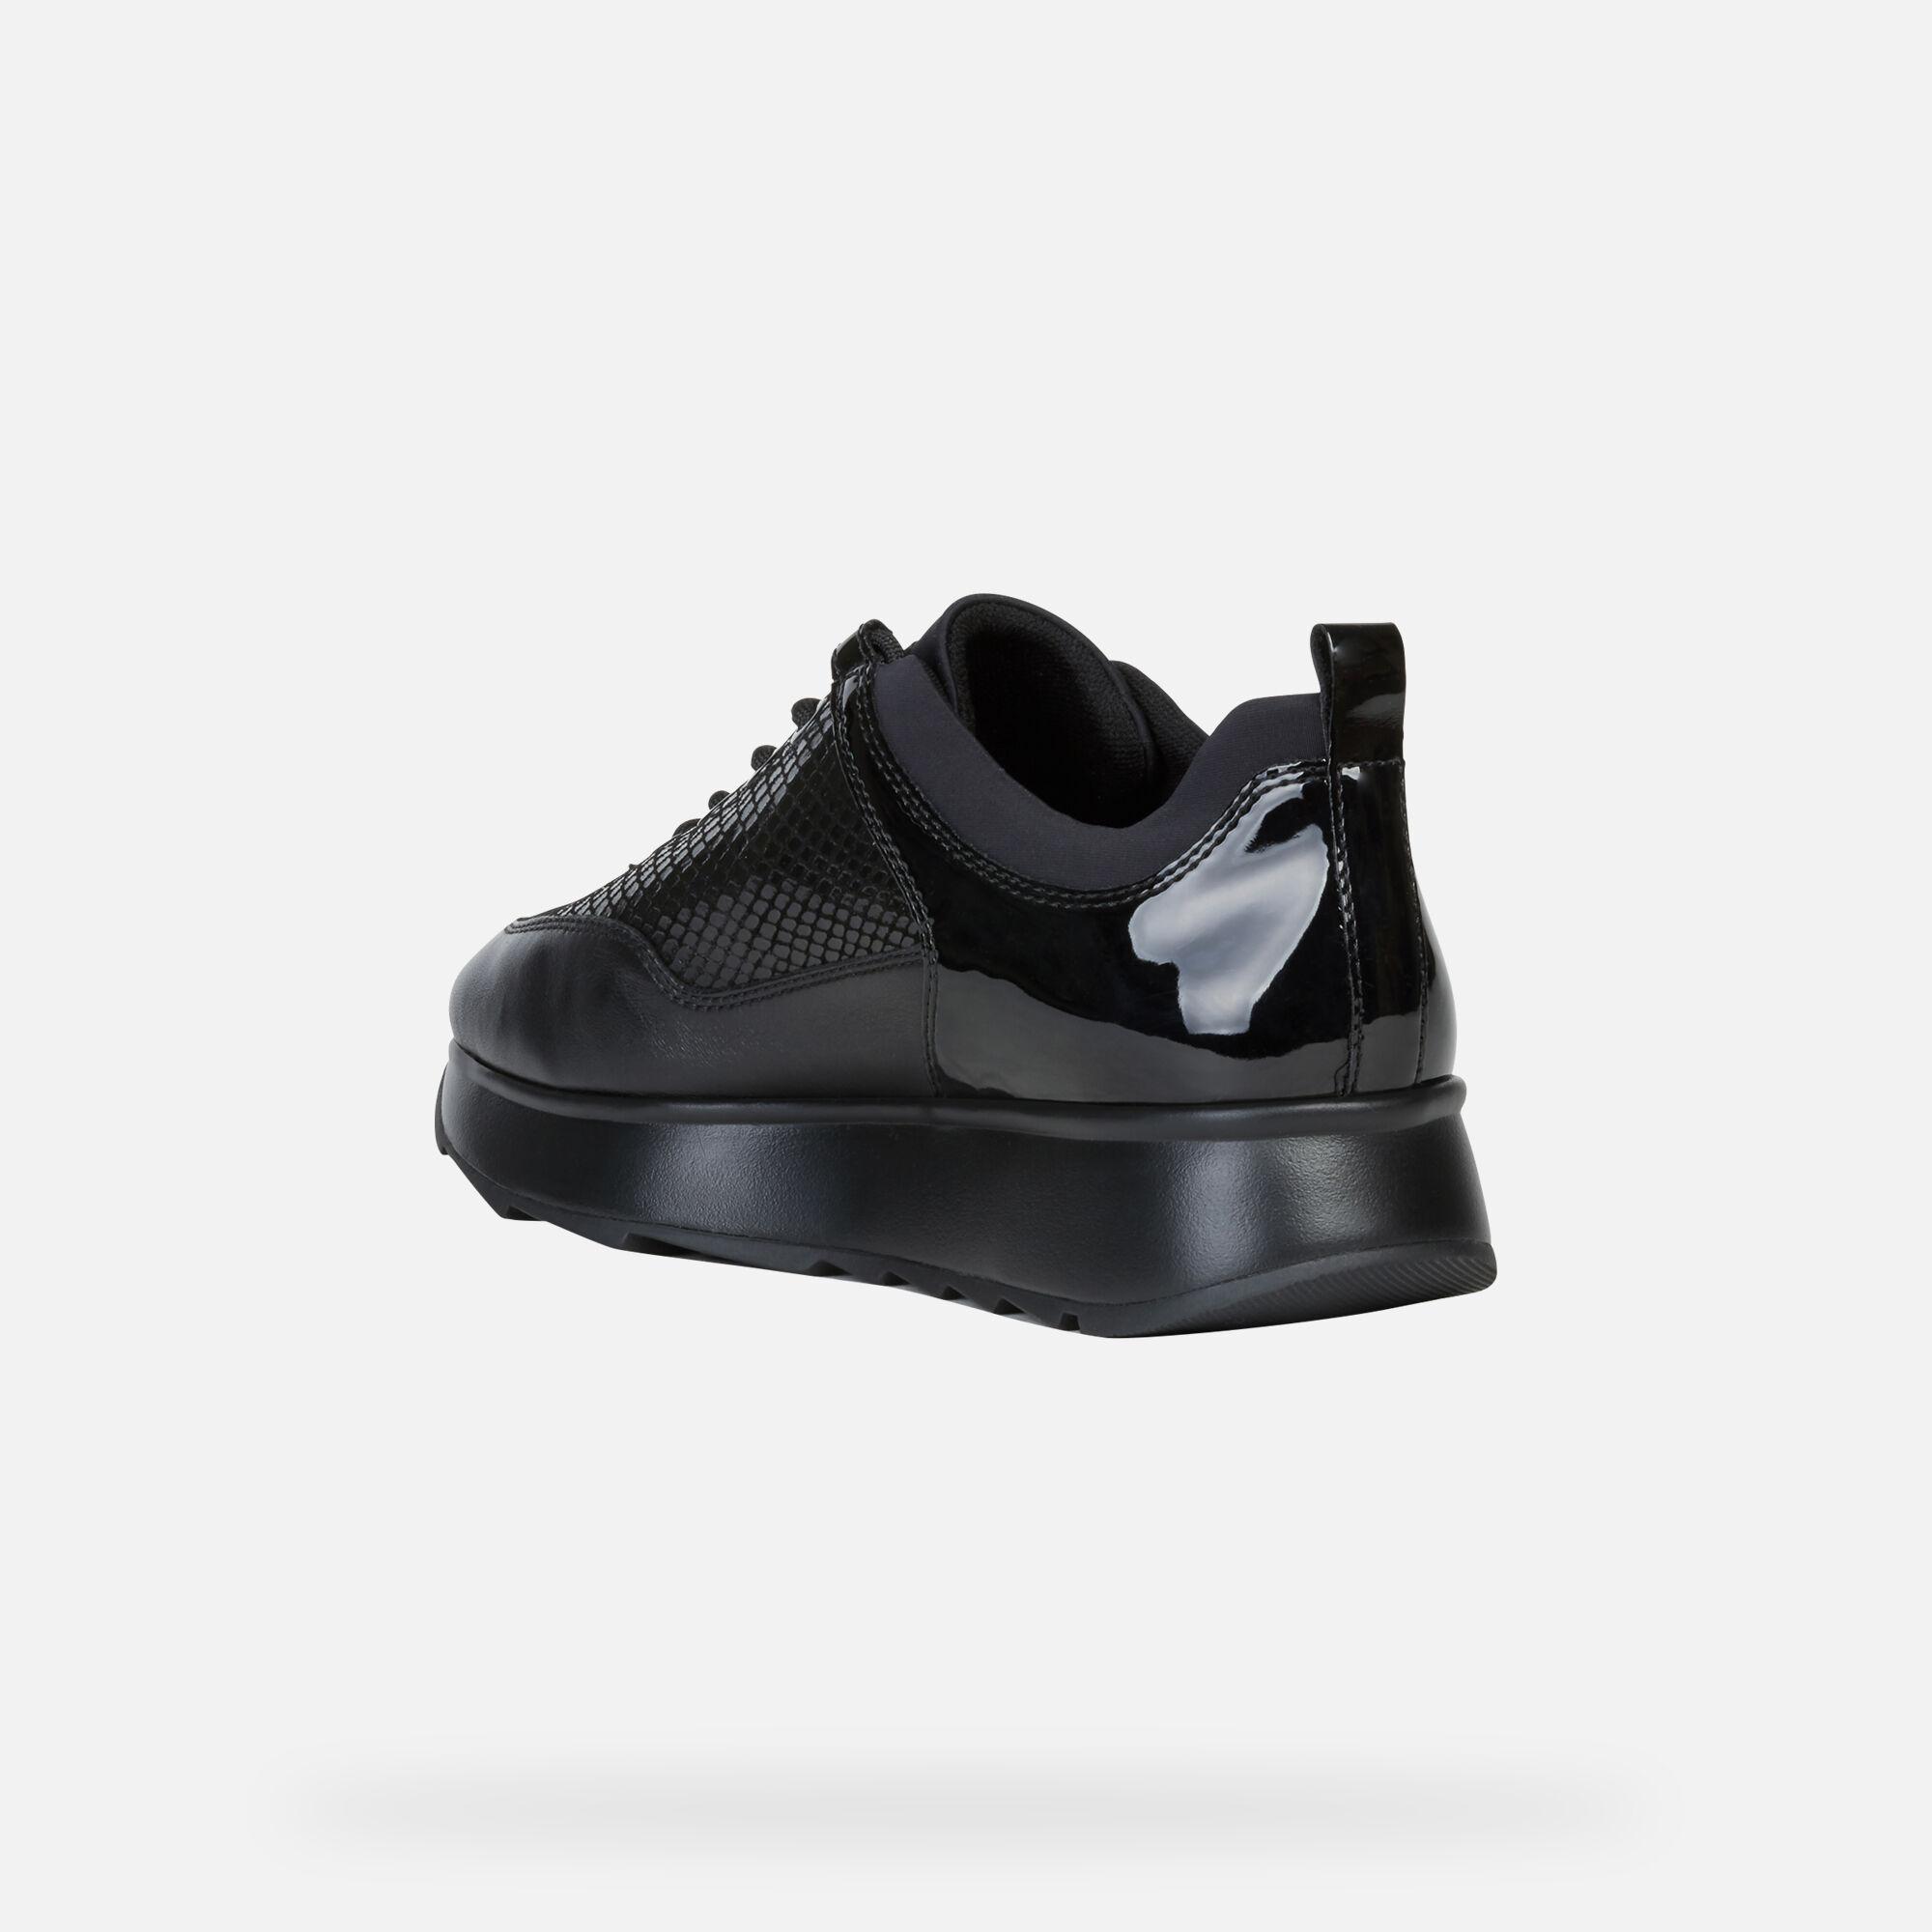 Geox Women's D GENDRY Black Sneakers | Geox¨ Official Store